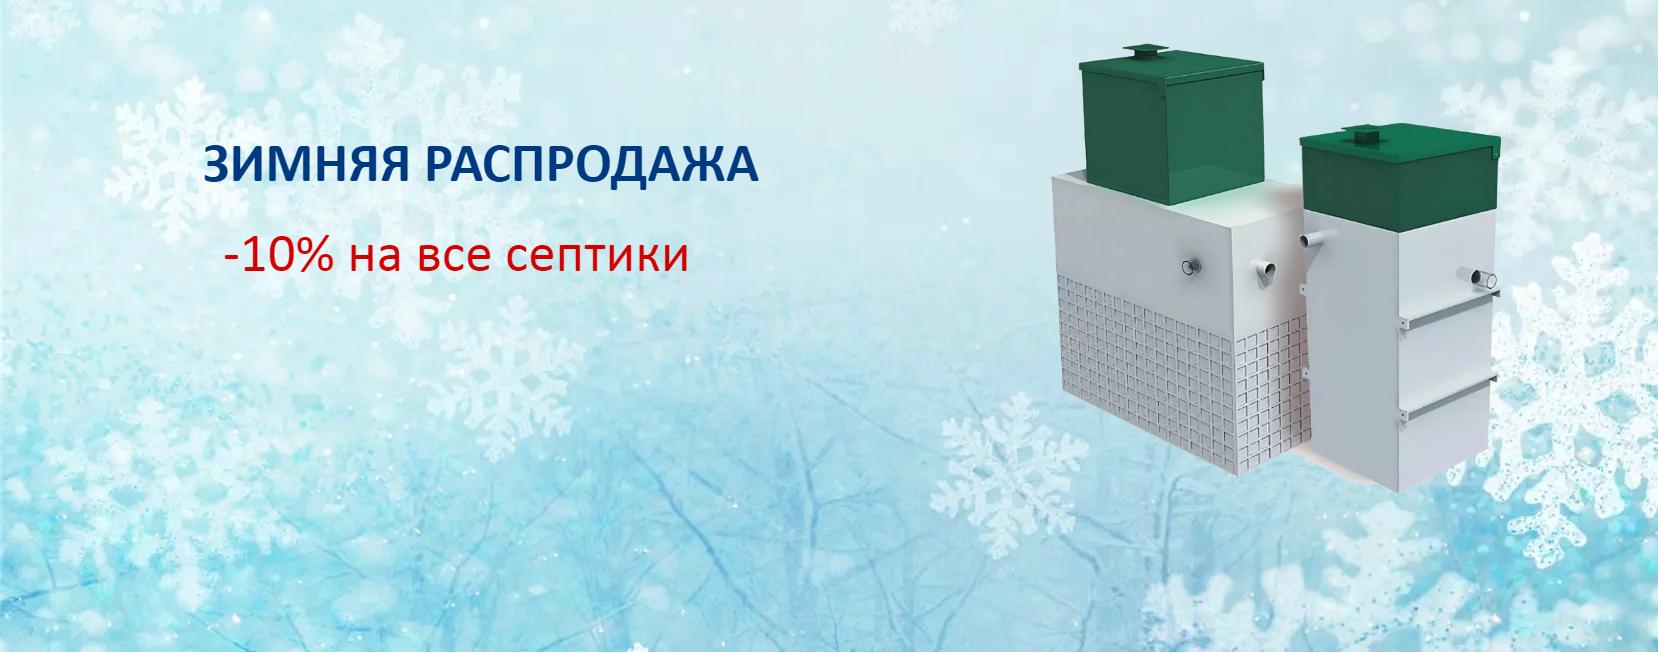 zim-baner2